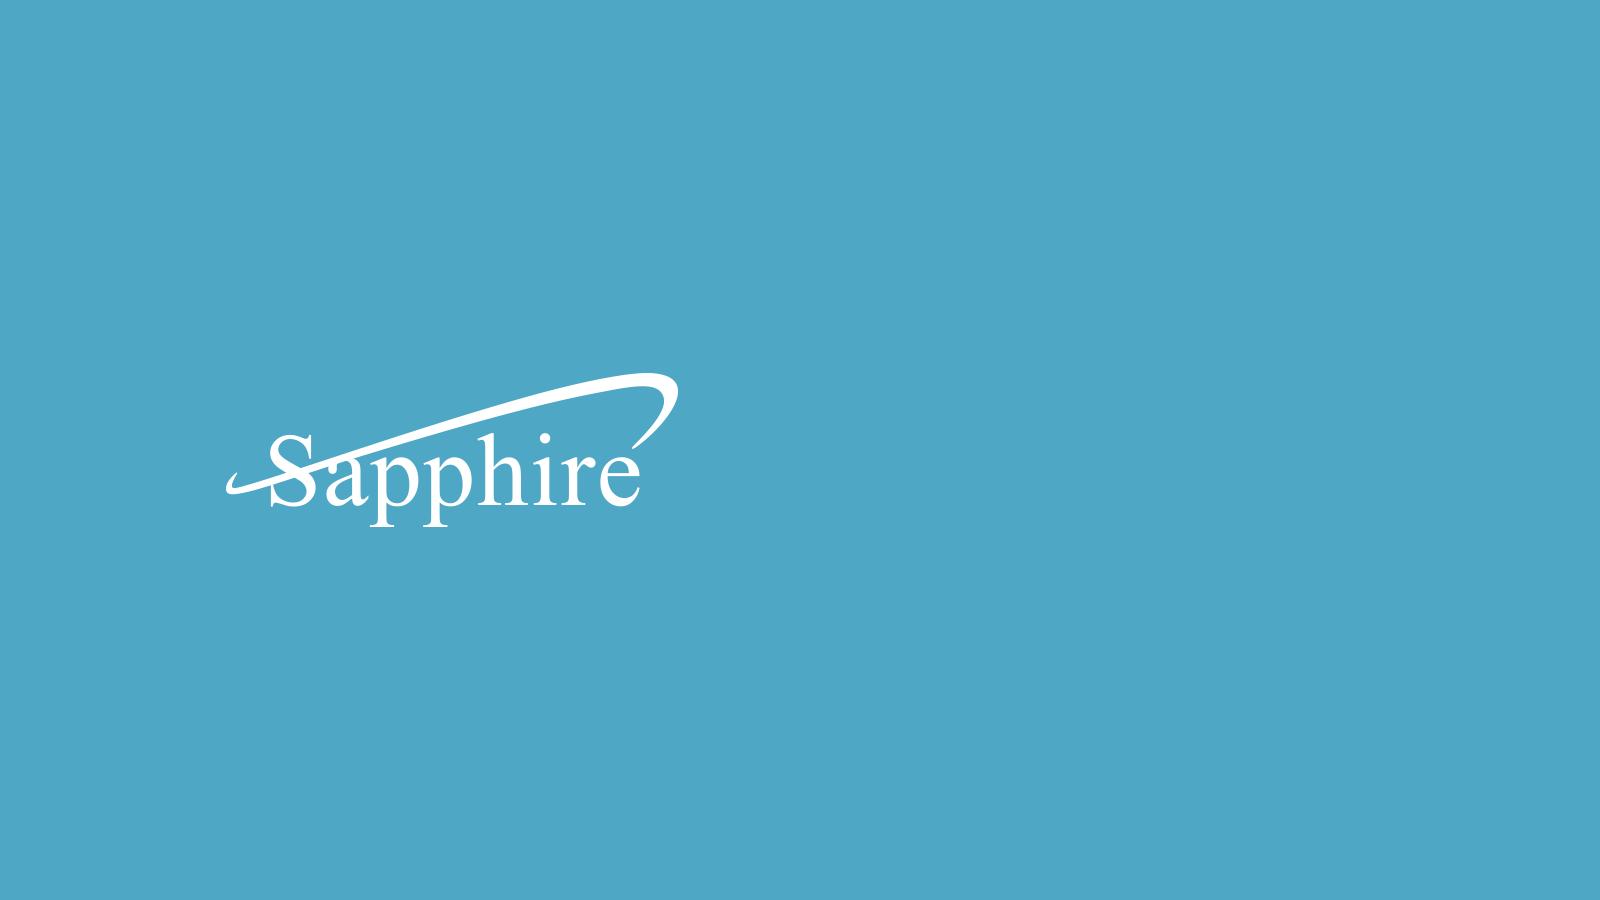 sapphire-textiles-graphic-brand-design-web-designer-hiline-lahore-pakistan-banner